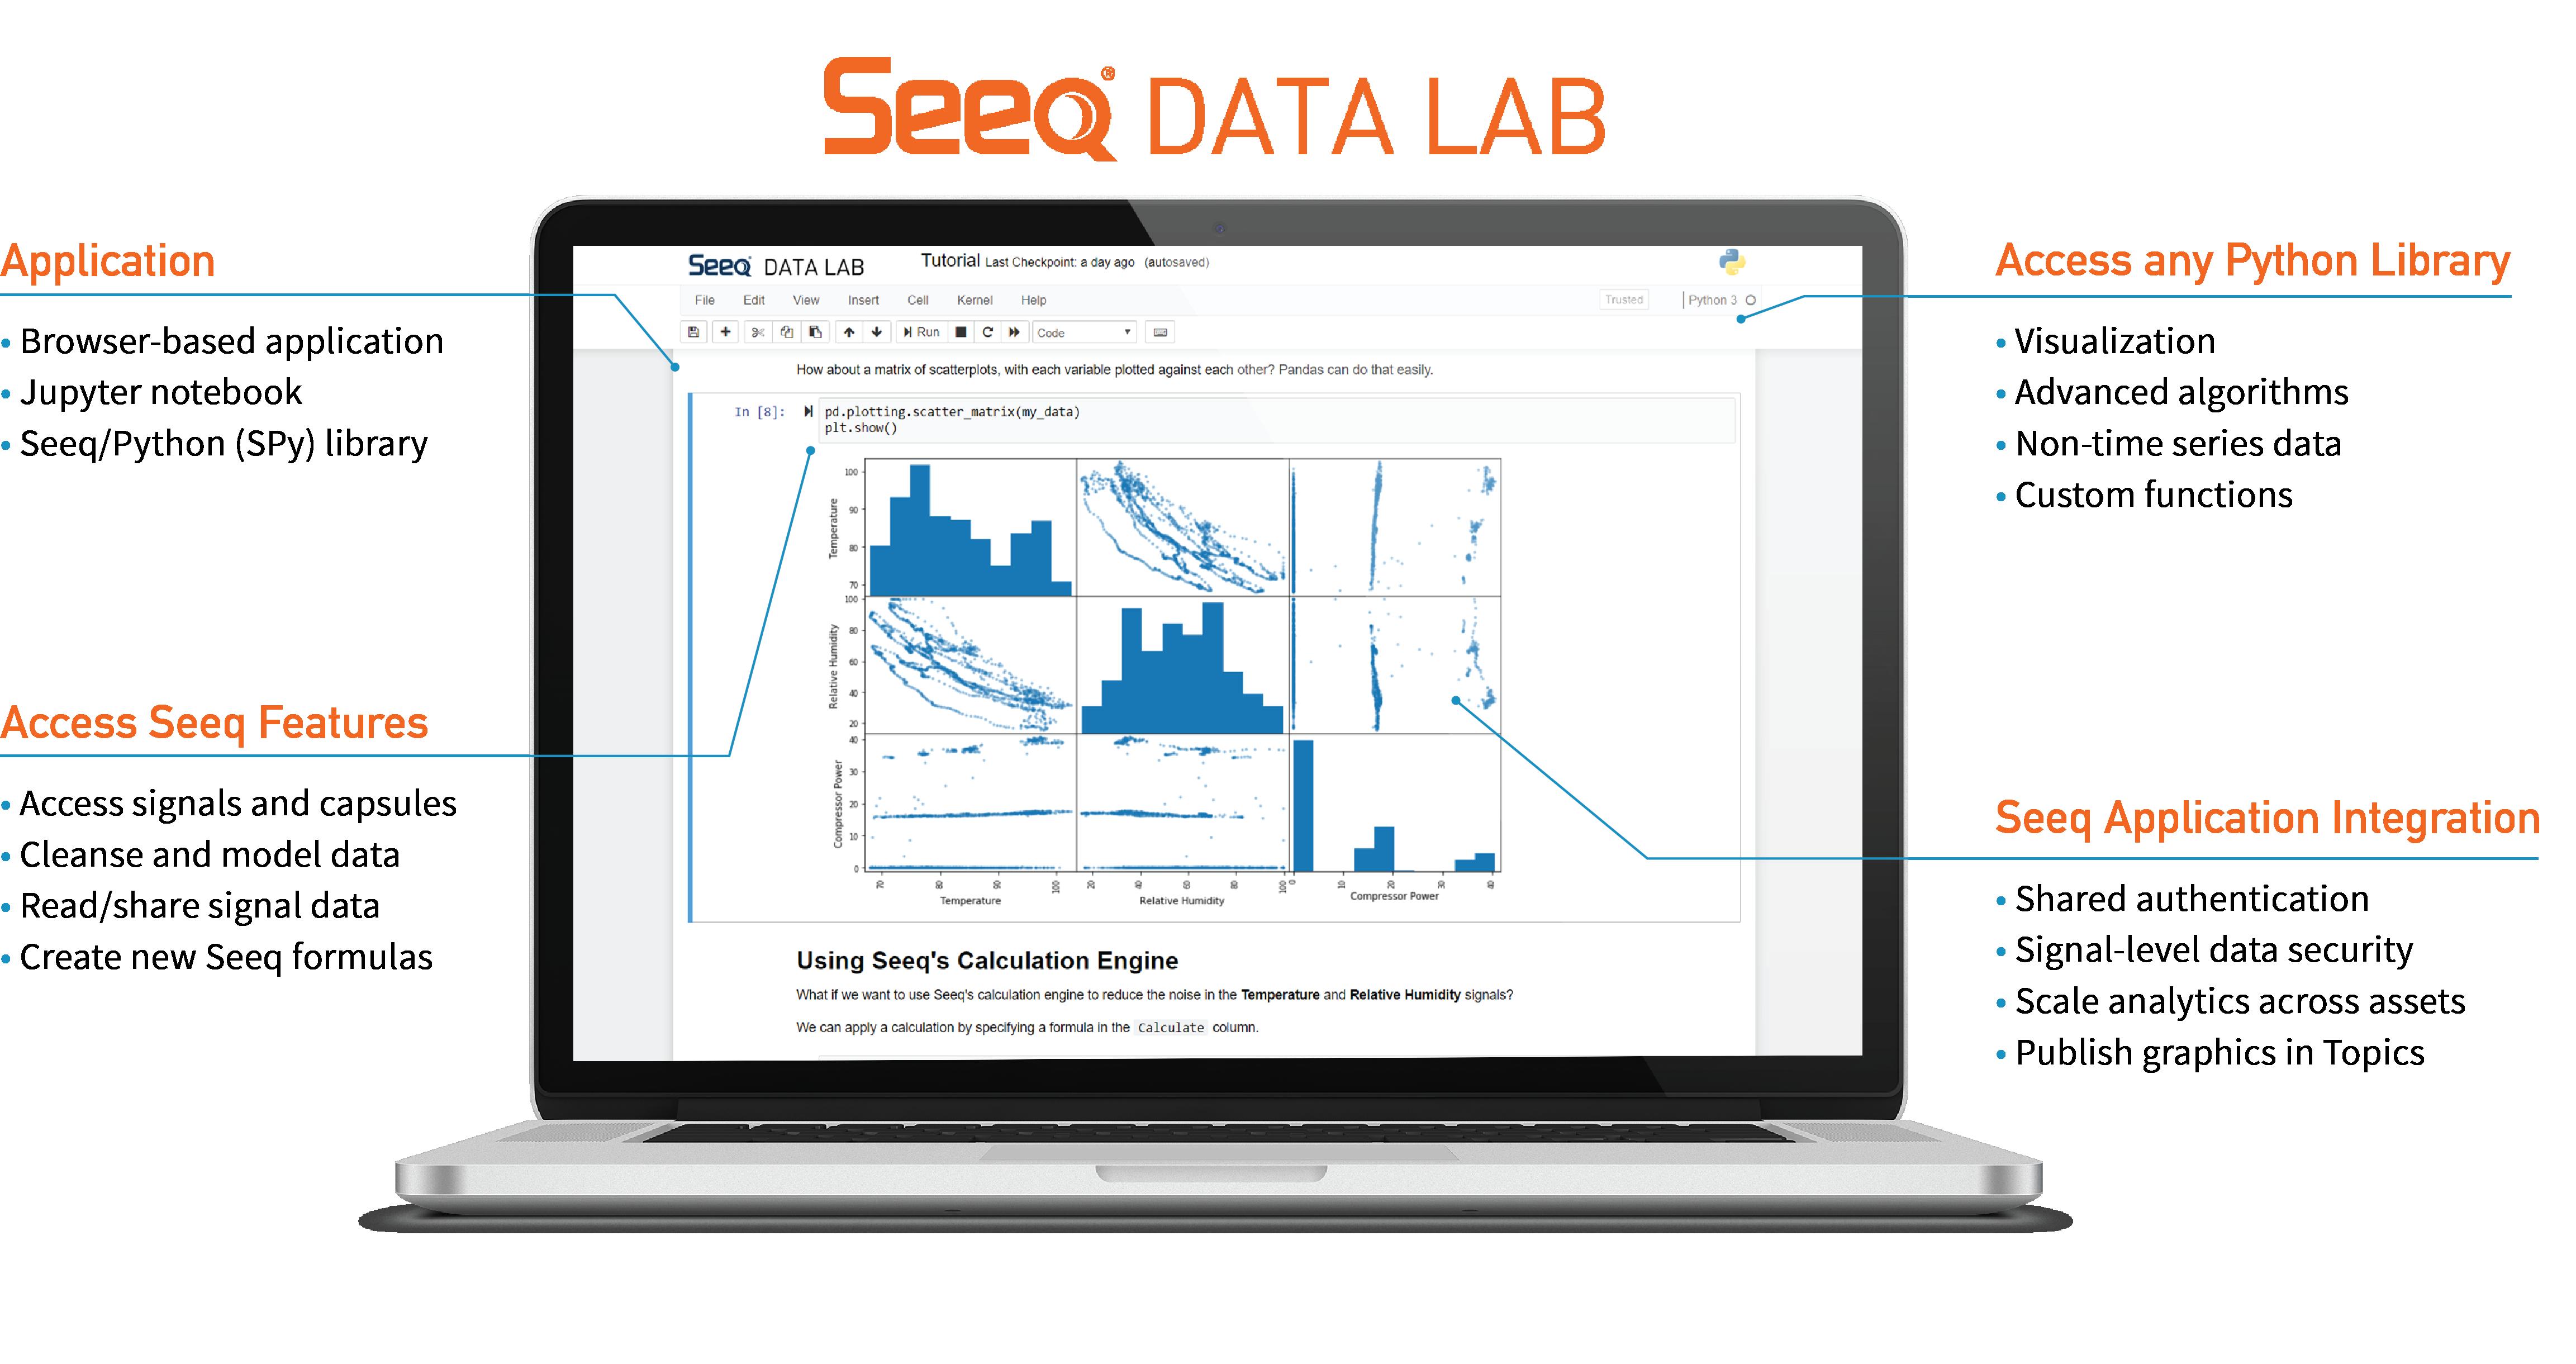 Seeq Data Lab